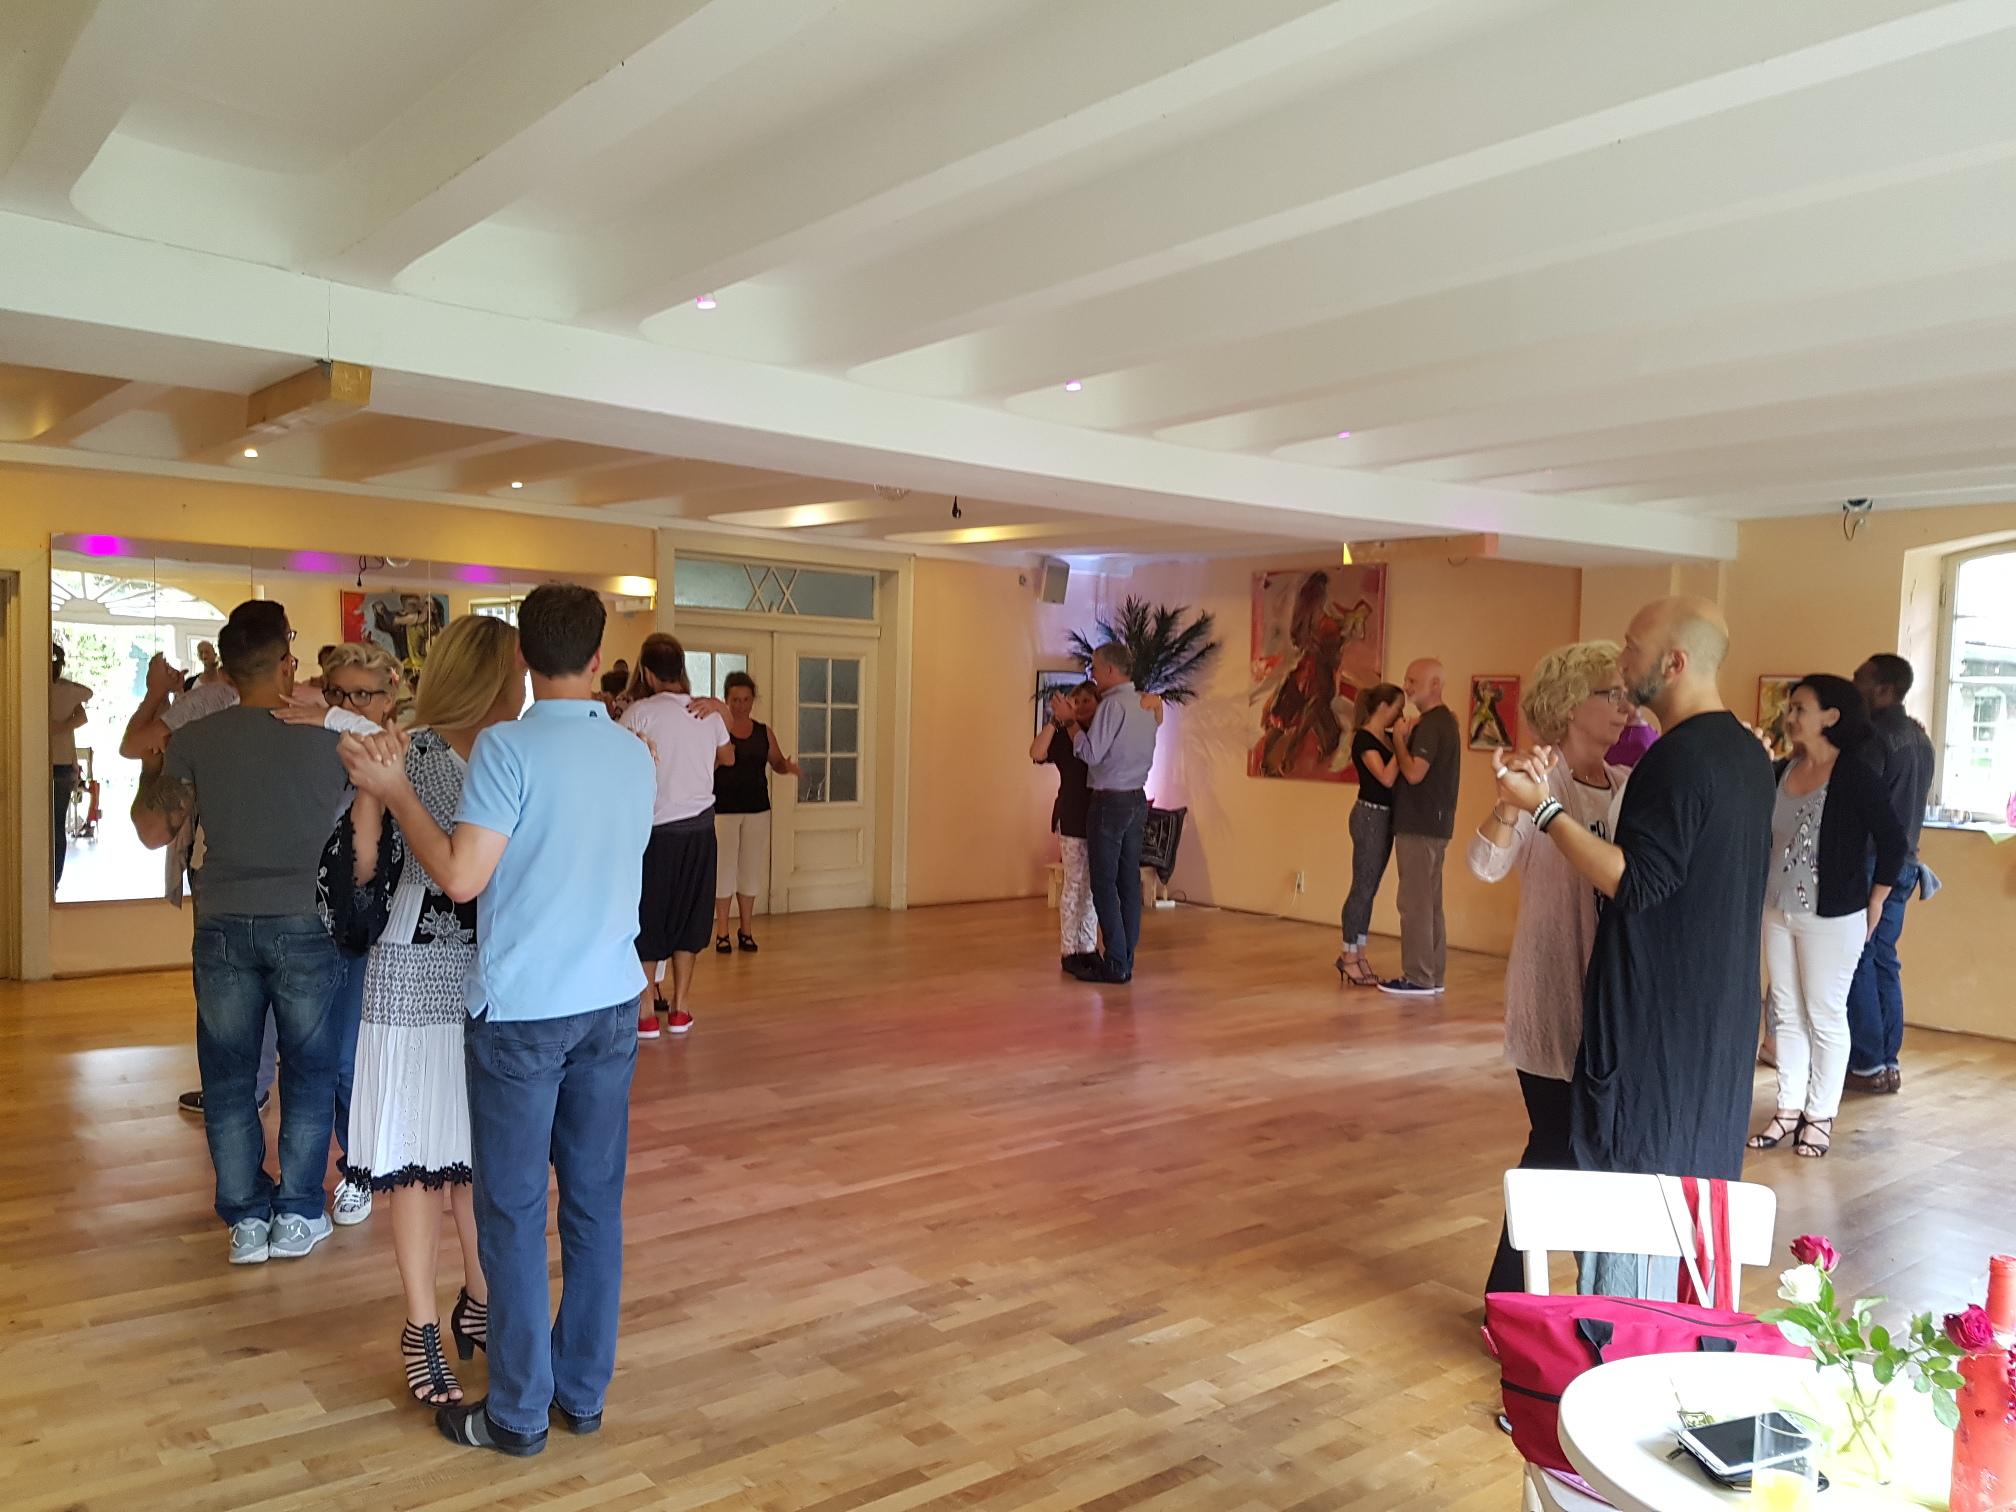 Tanzkurse für singles krefeld